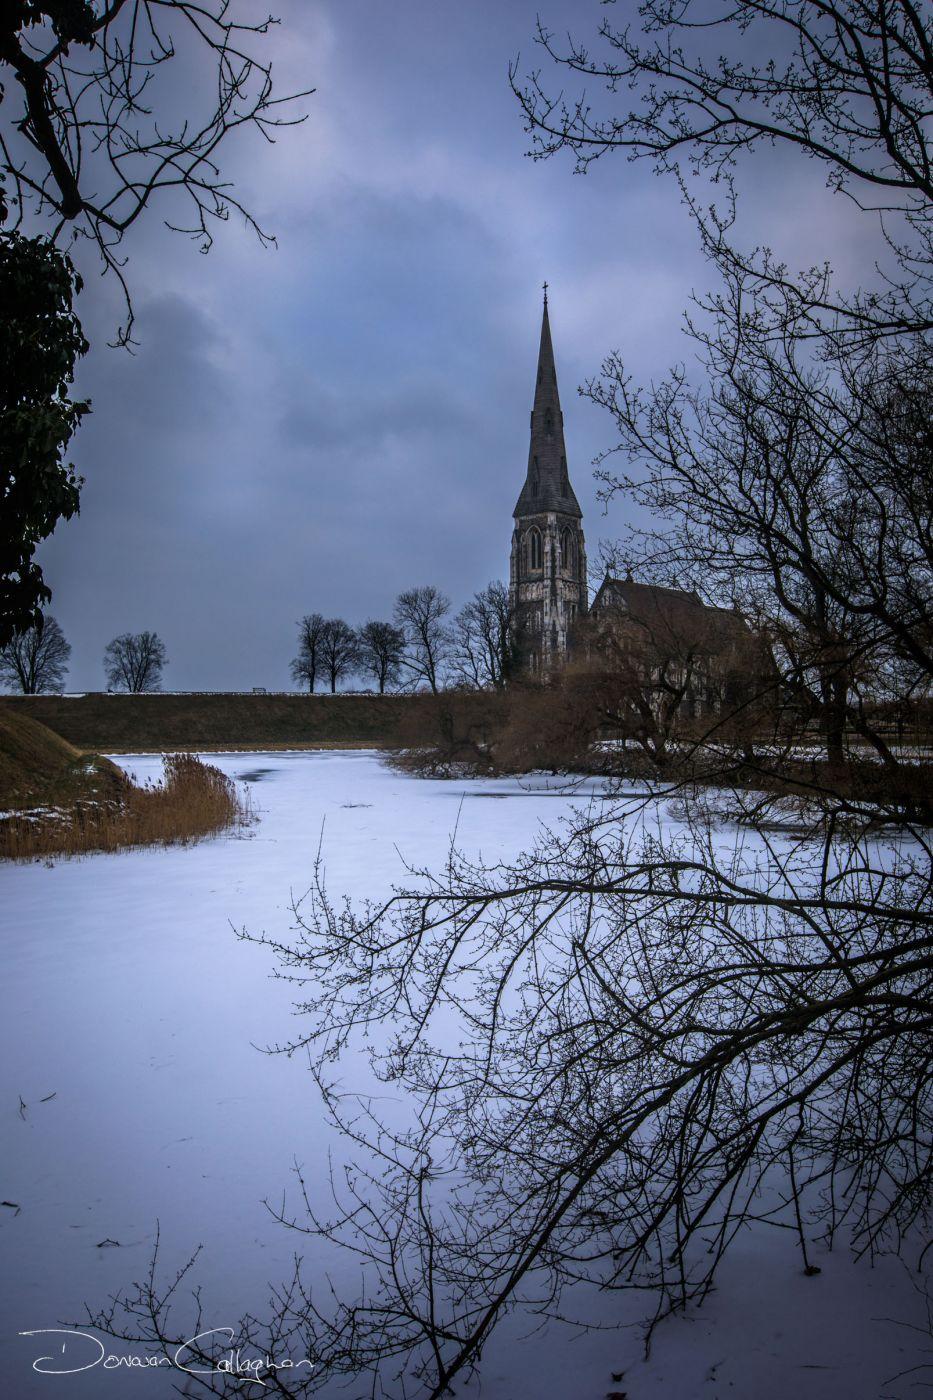 St Alban's Church, Denmark